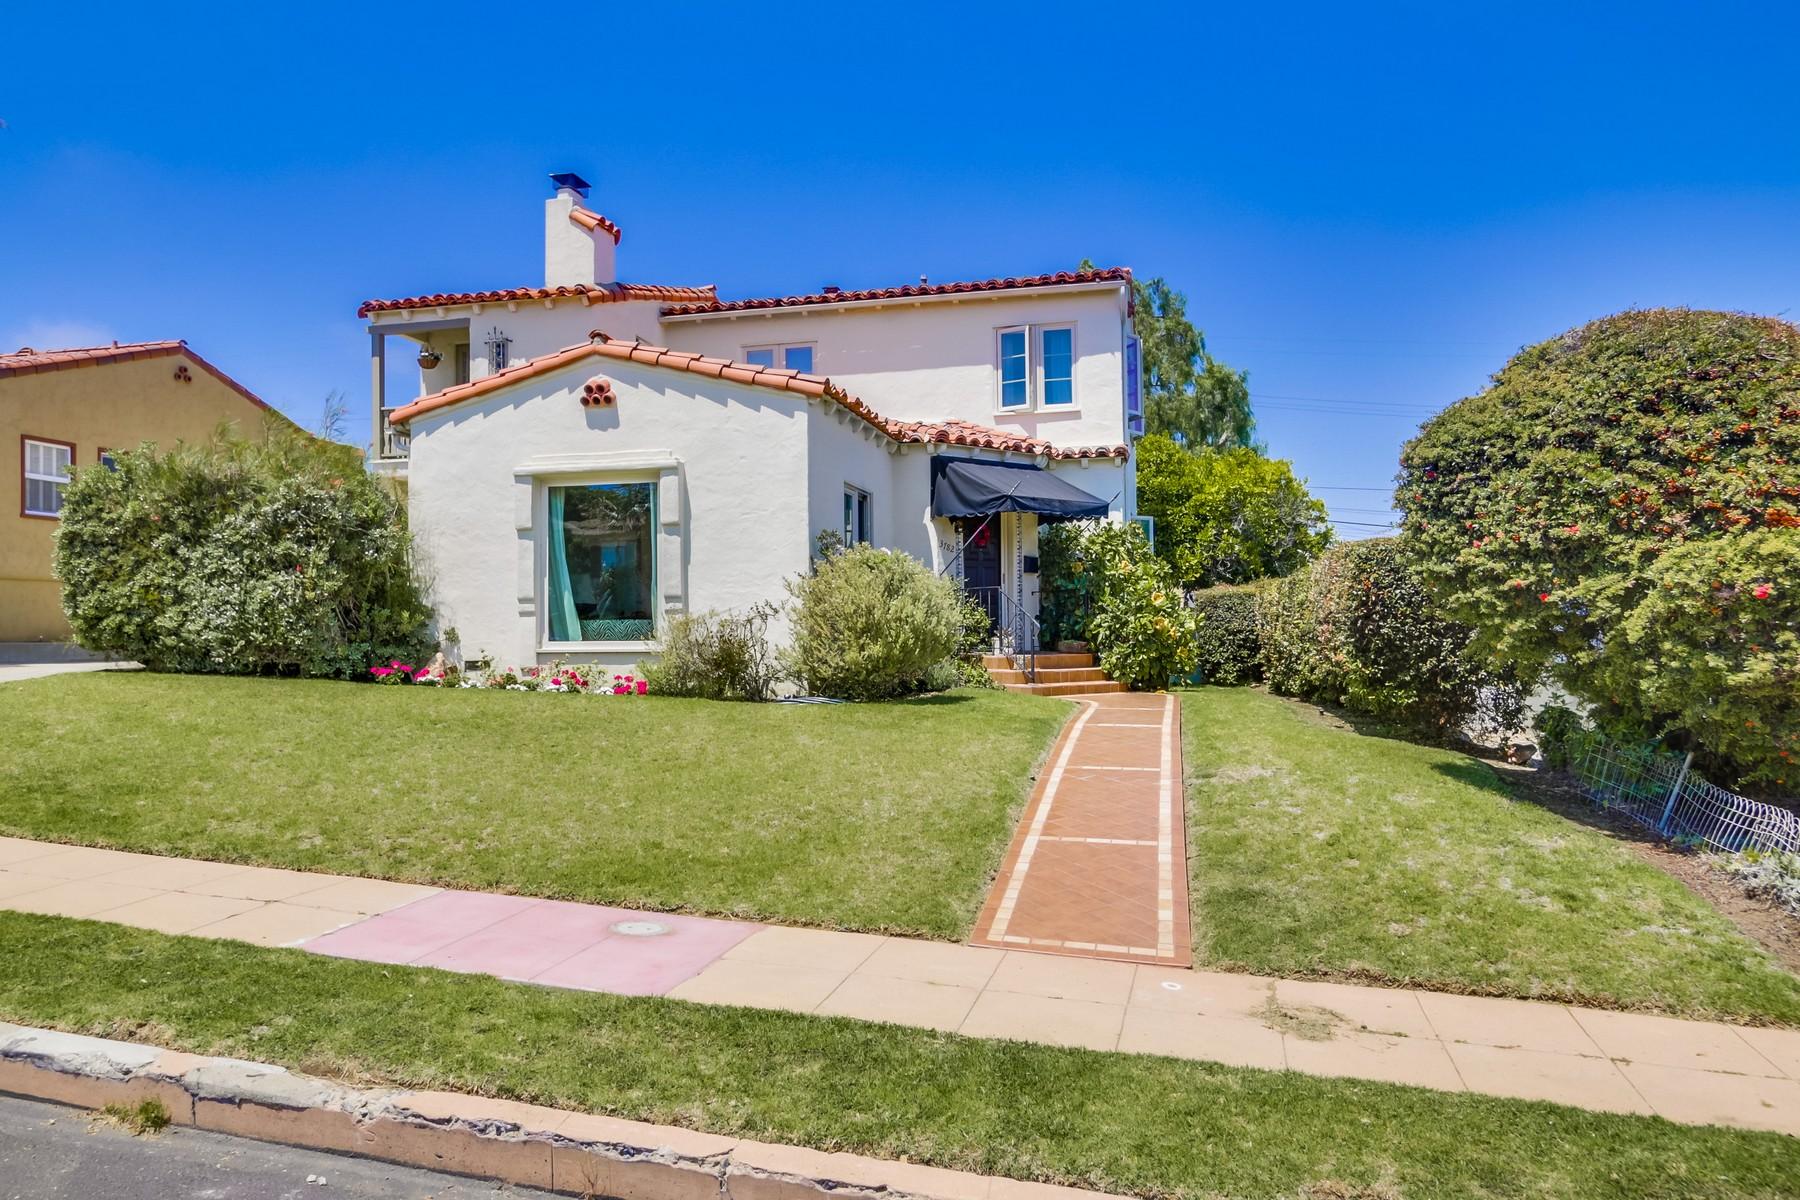 Single Family Home for Sale at 3782 Milan 3782 Milan Street San Diego, California 92107 United States